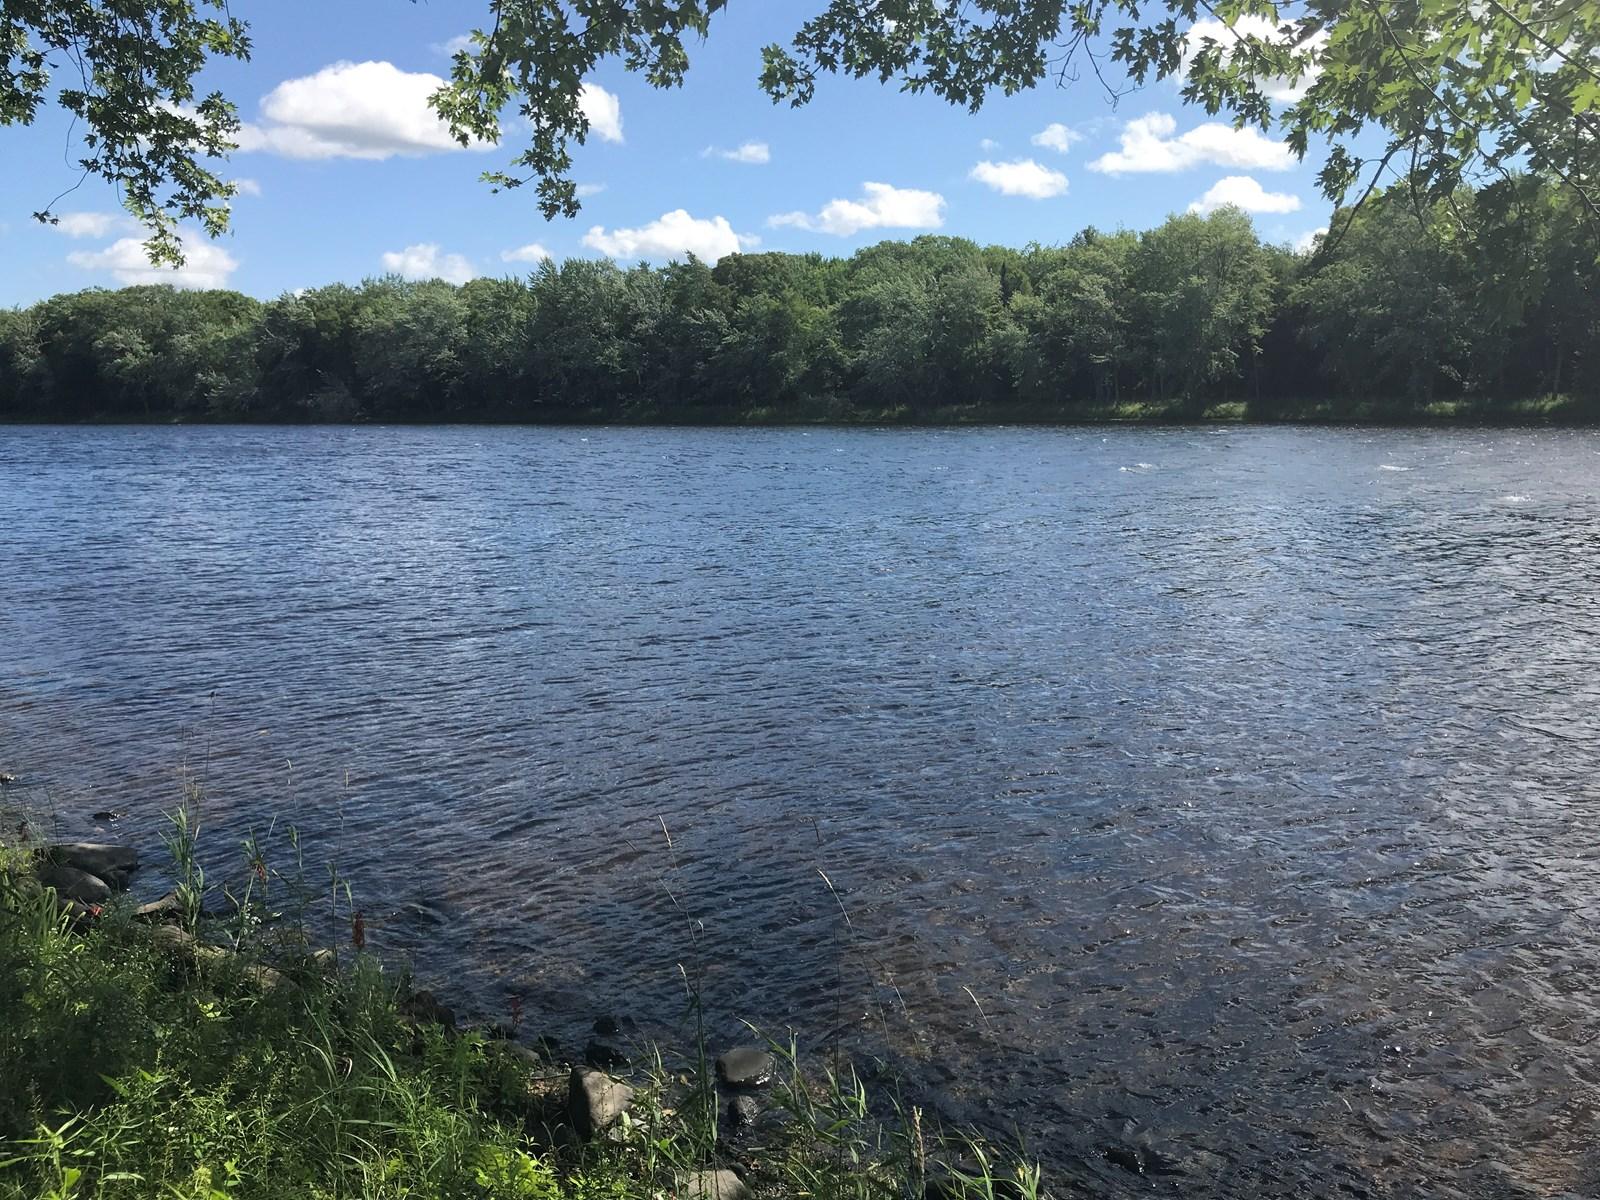 Maine Riverfront Lot For Sale